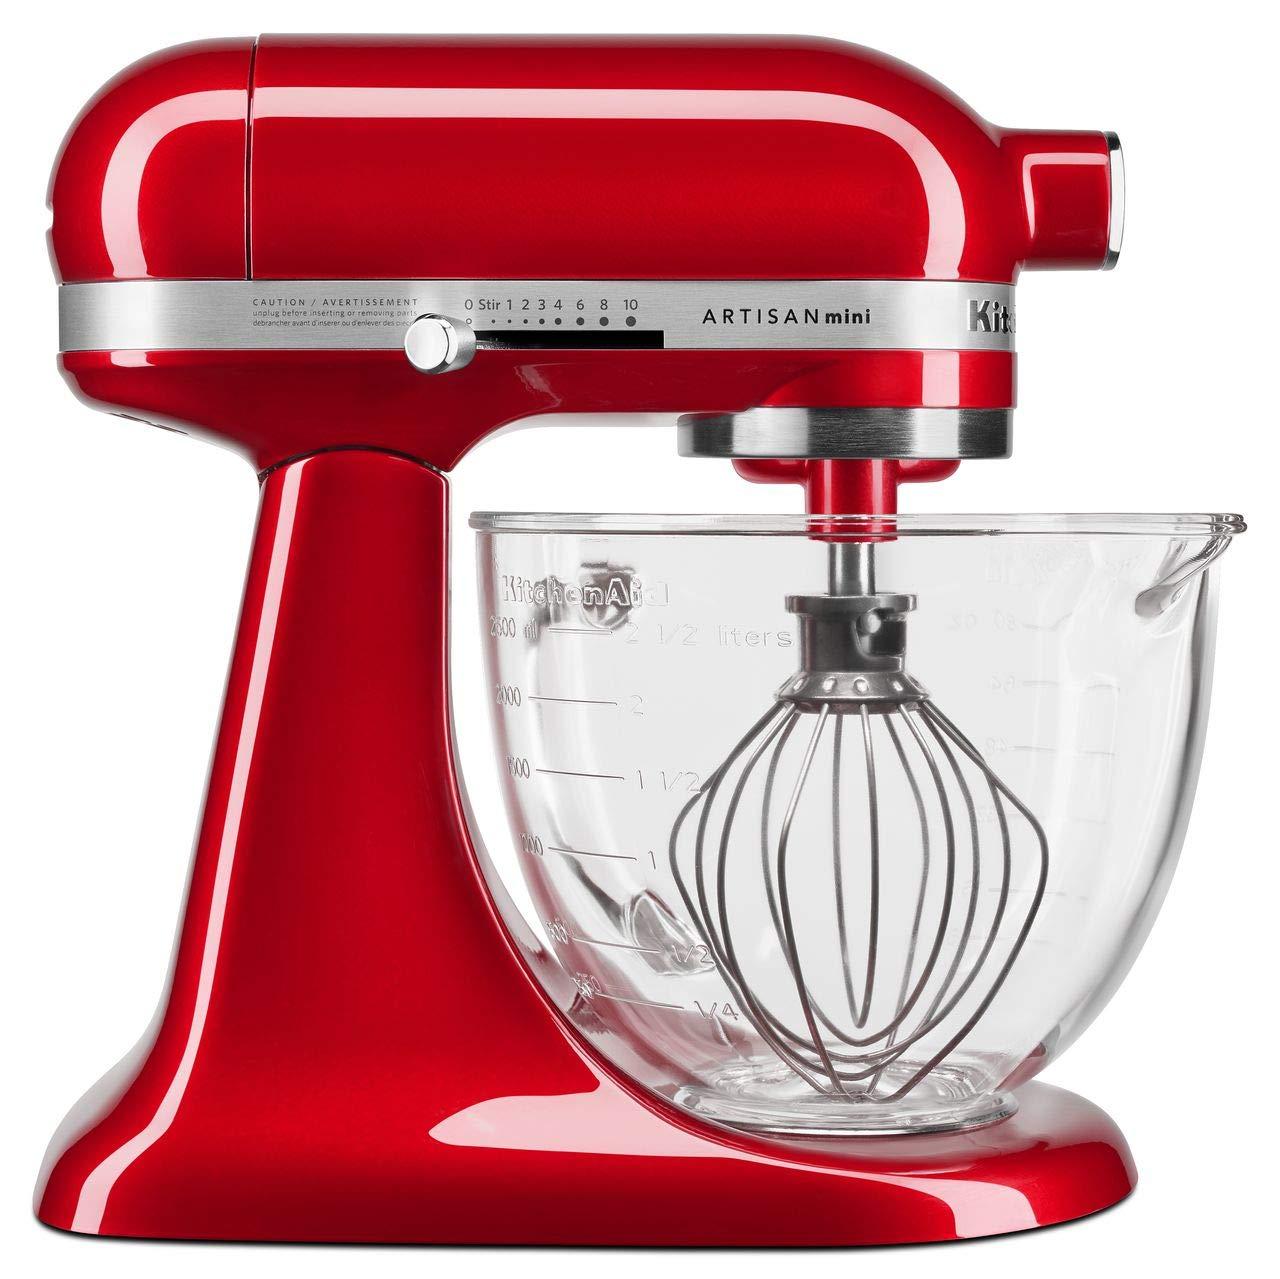 KitchenAid KSM3306XCA Artisan Mini Design Series 3.5 Quart Tilt-Head Stand Mixer, Candy Apple Red by KitchenAid